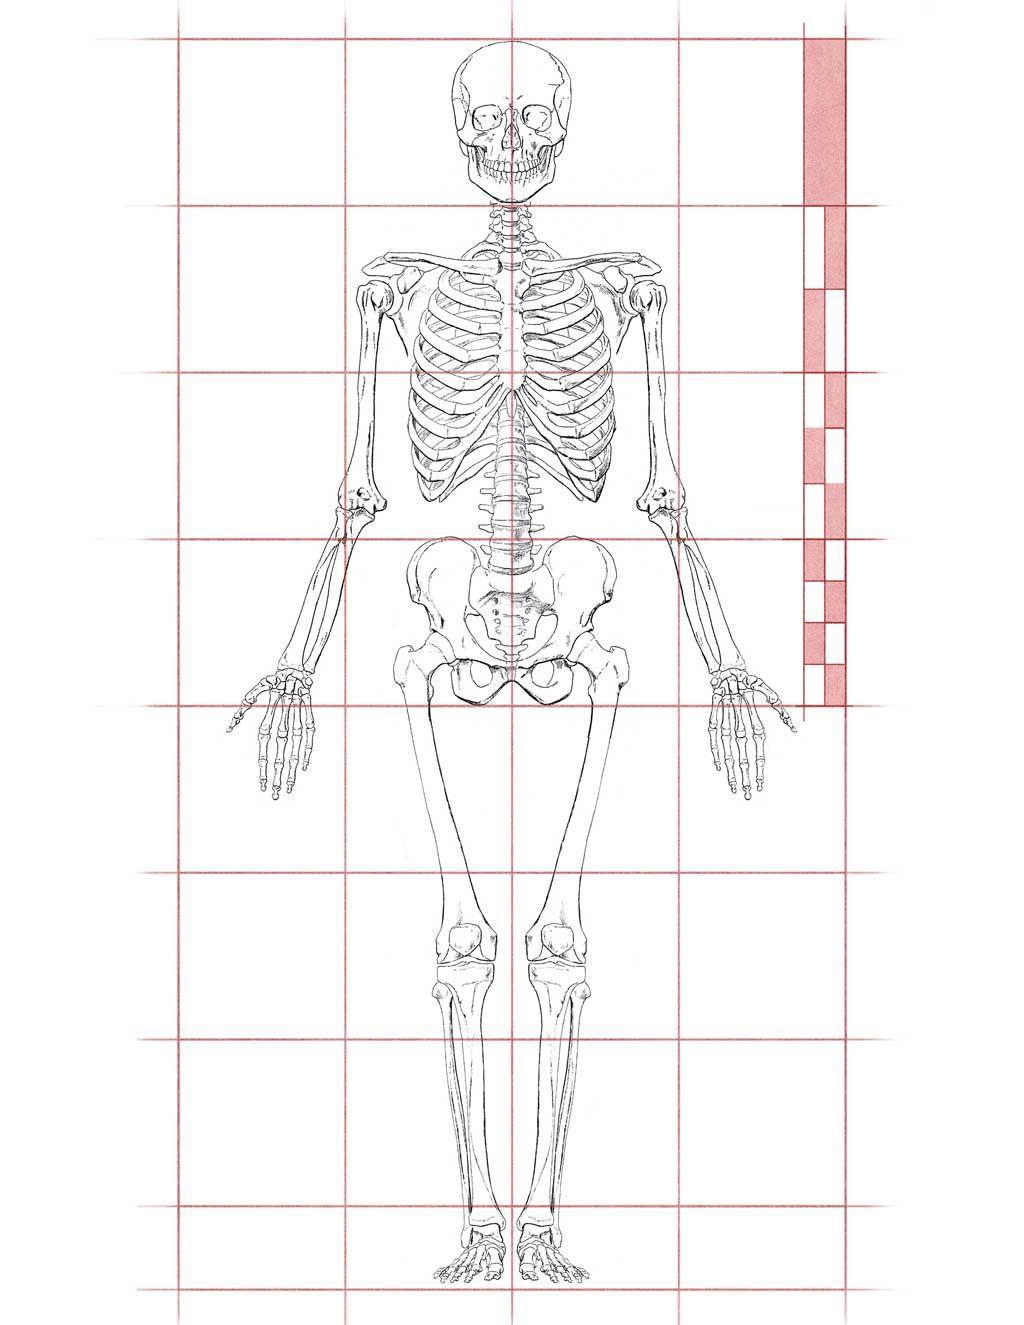 hight resolution of artistic anatomy dr paul richer skeletal study 7 1 2 head proportion study artstudy artanatomy humanproportion proportion skeleton hartman